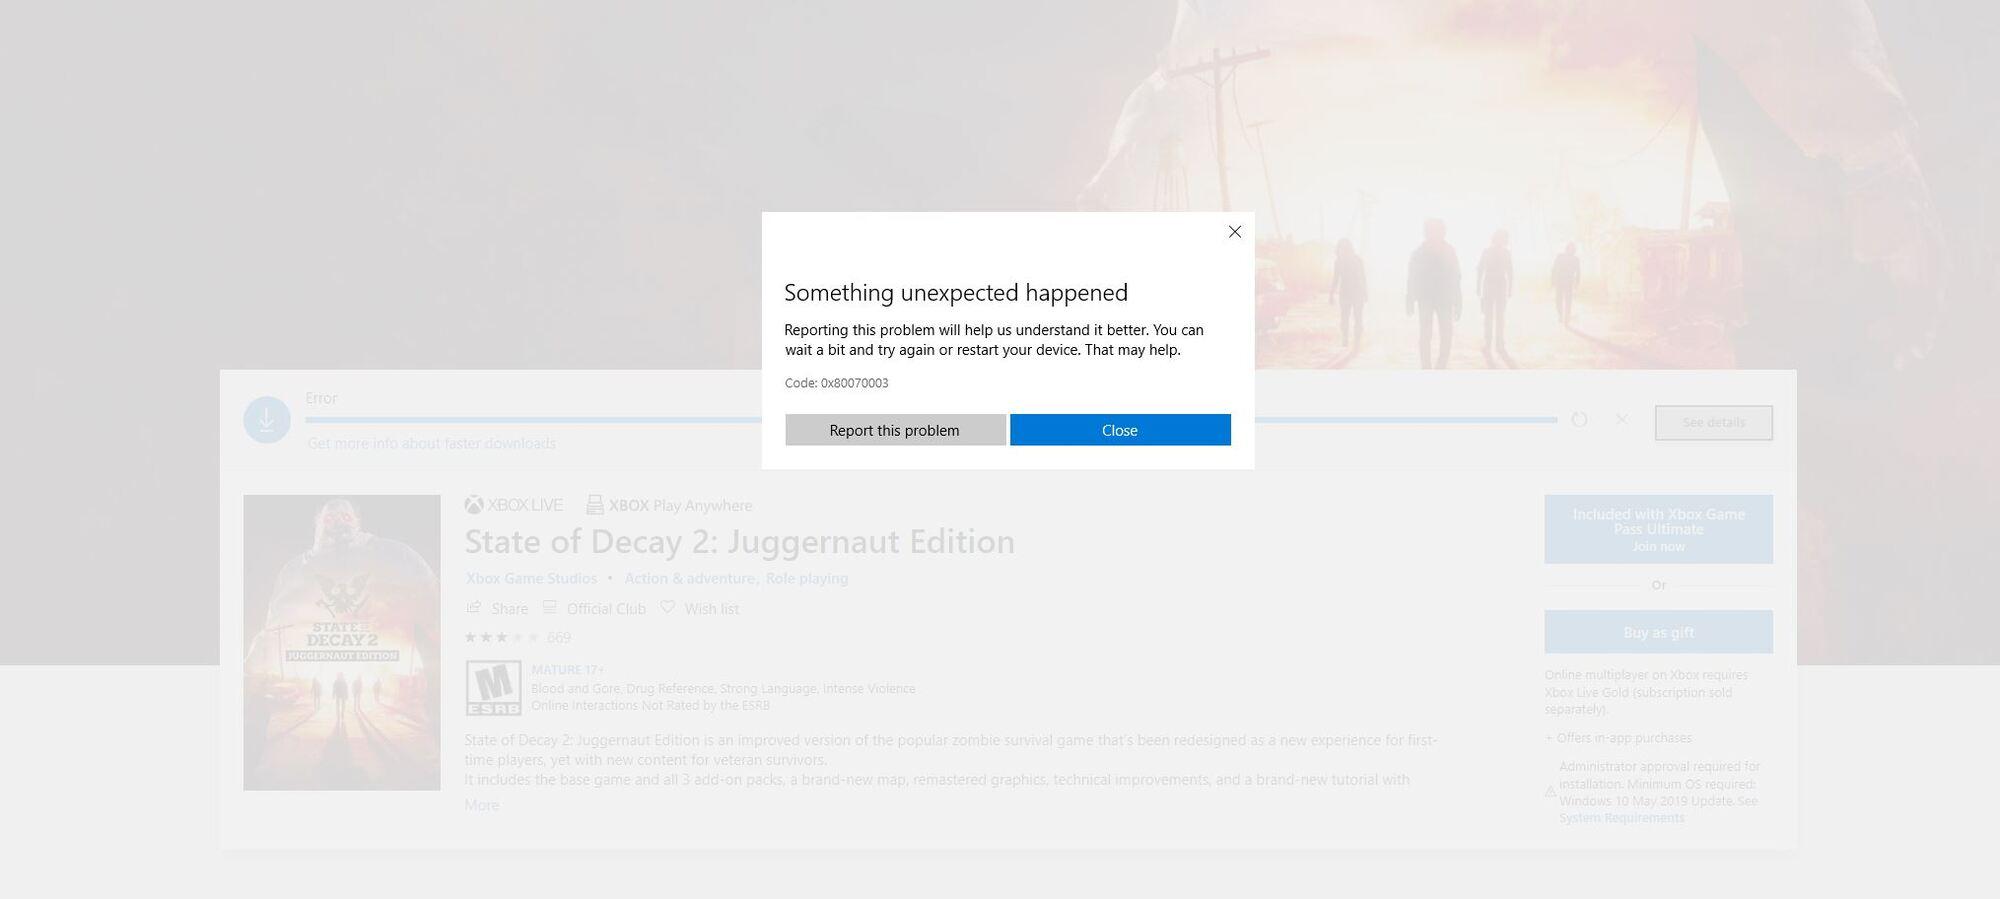 State of Decay 2 Juggernaut Edition - Can't play it after first machine restart unless I... 6feda2a6-37fd-4ba2-bbce-5593026b6e15?upload=true.jpg